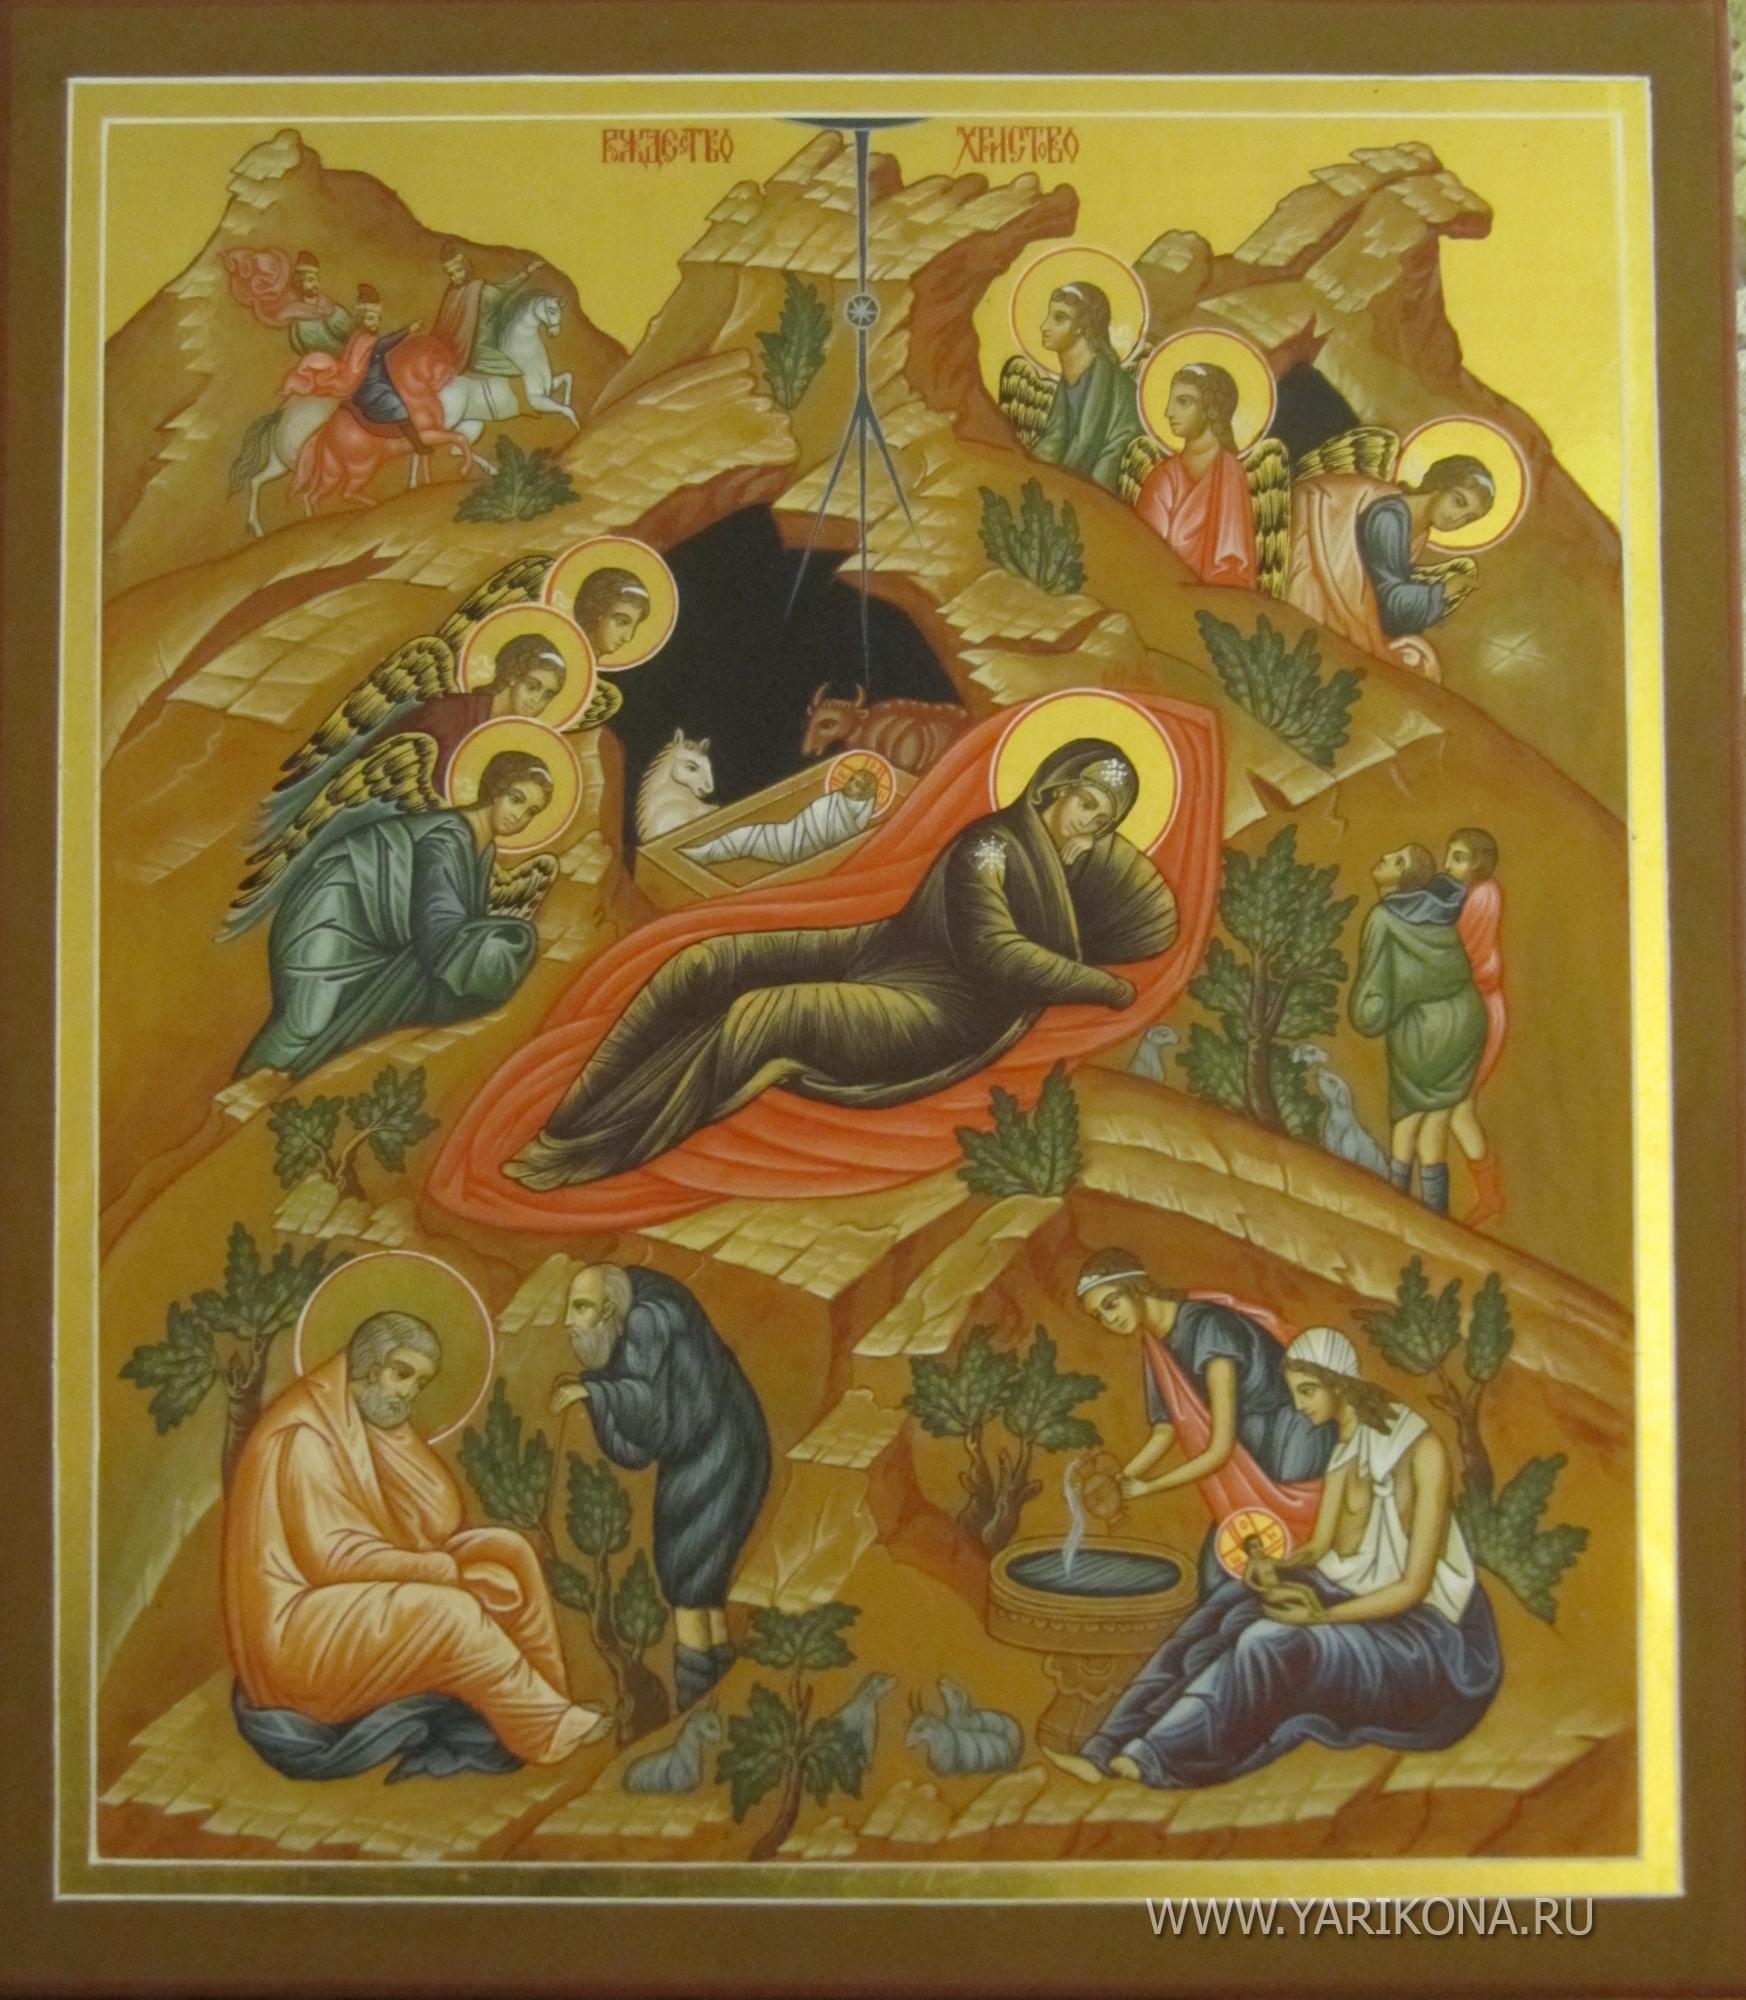 ... икона «Рождество Христово» :: ЯрИкона: www.yarikona.ru/catalog/rozhdestvo-hristovo.htm